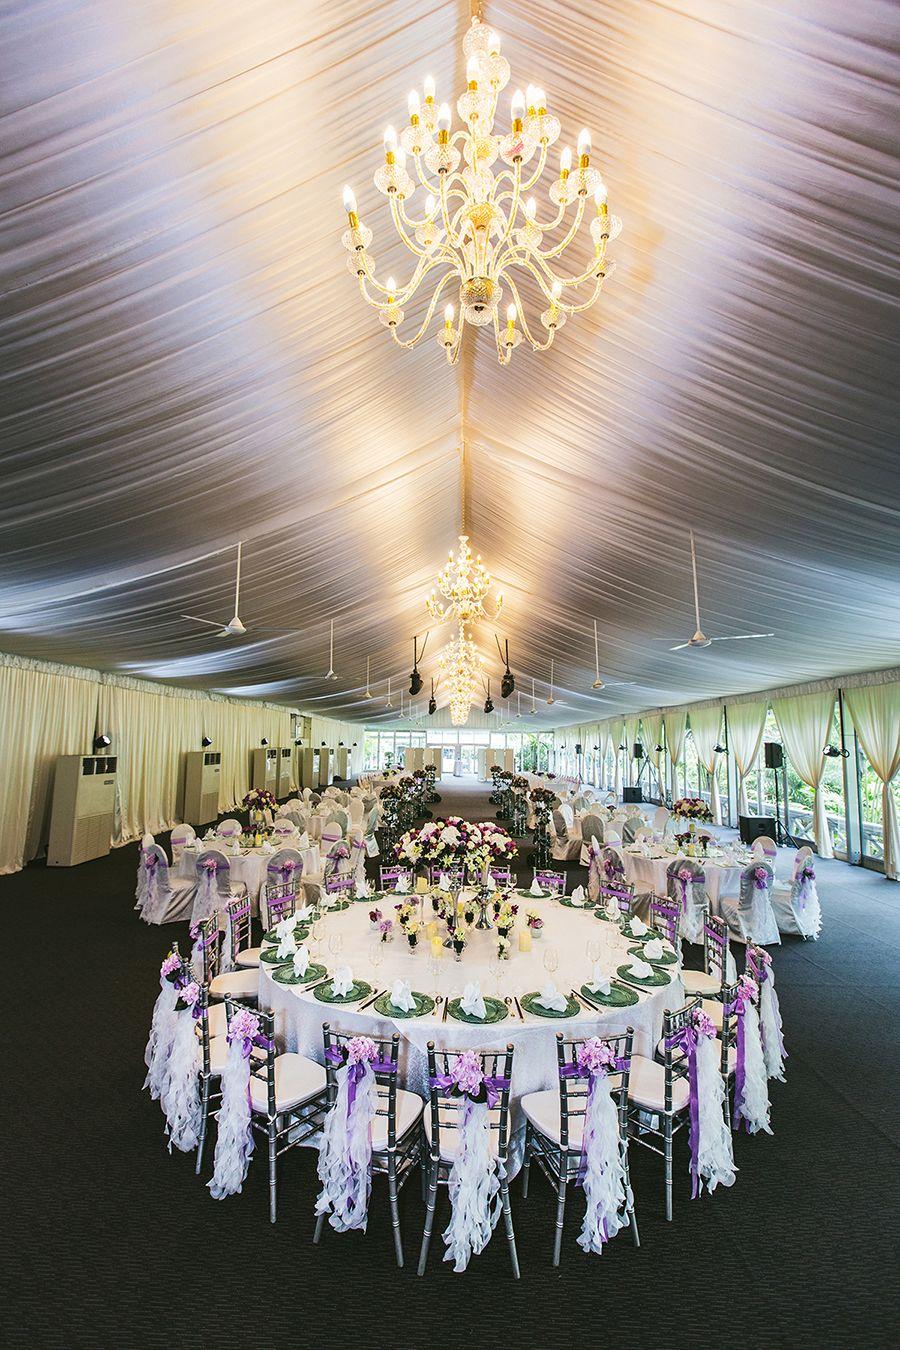 wedding reception photo booth singapore%0A Jamie and Gidania u    s Roaring Twenties Wedding at Capella  Singapore    Sentosa   Singapore Wedding Venues   Pinterest   Roaring twenties  Wedding  venues and